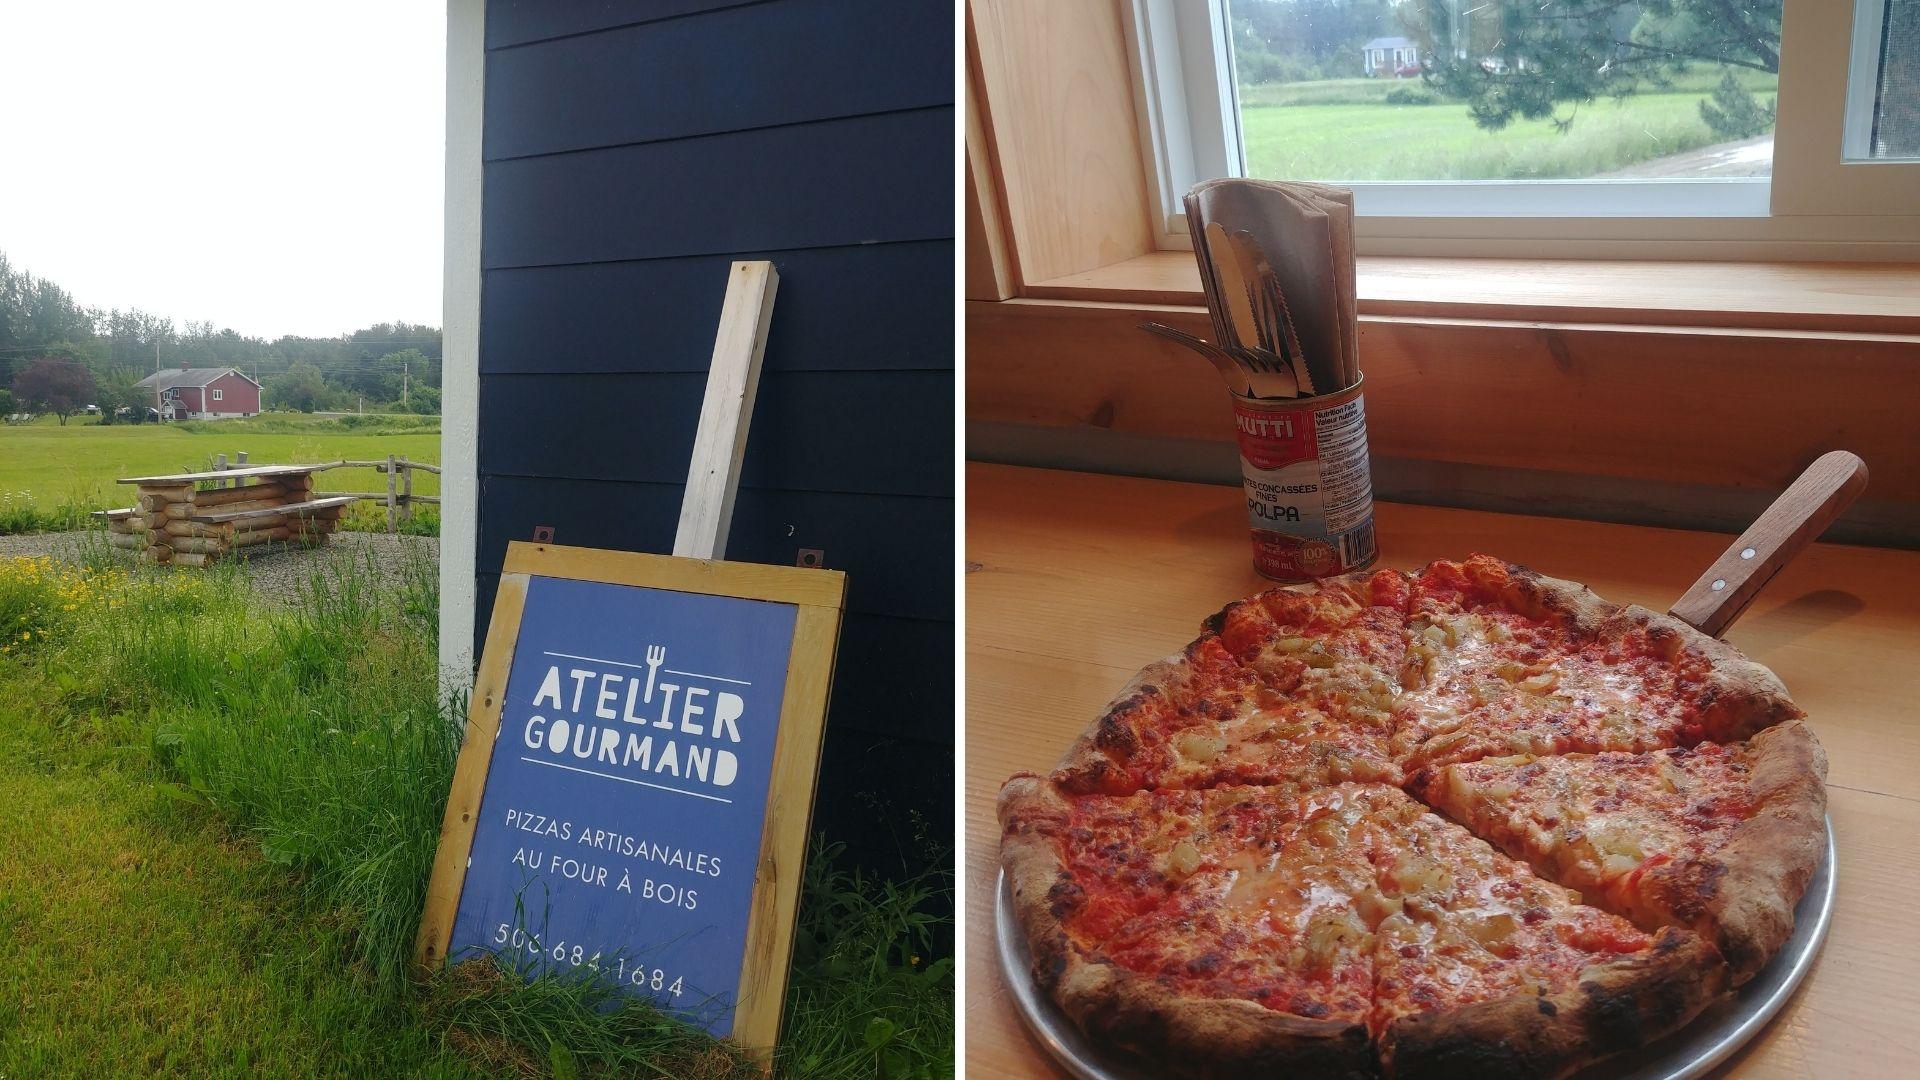 Pizzeria l'Atelier gourmand, Charlo, Nouveau-Brunswick